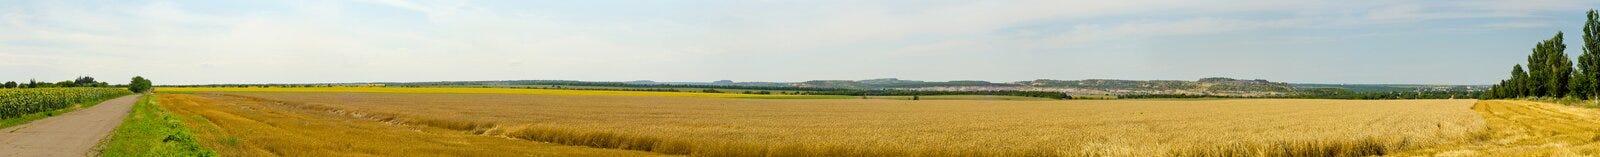 Panorama des Weizenfeldes Stockbilder